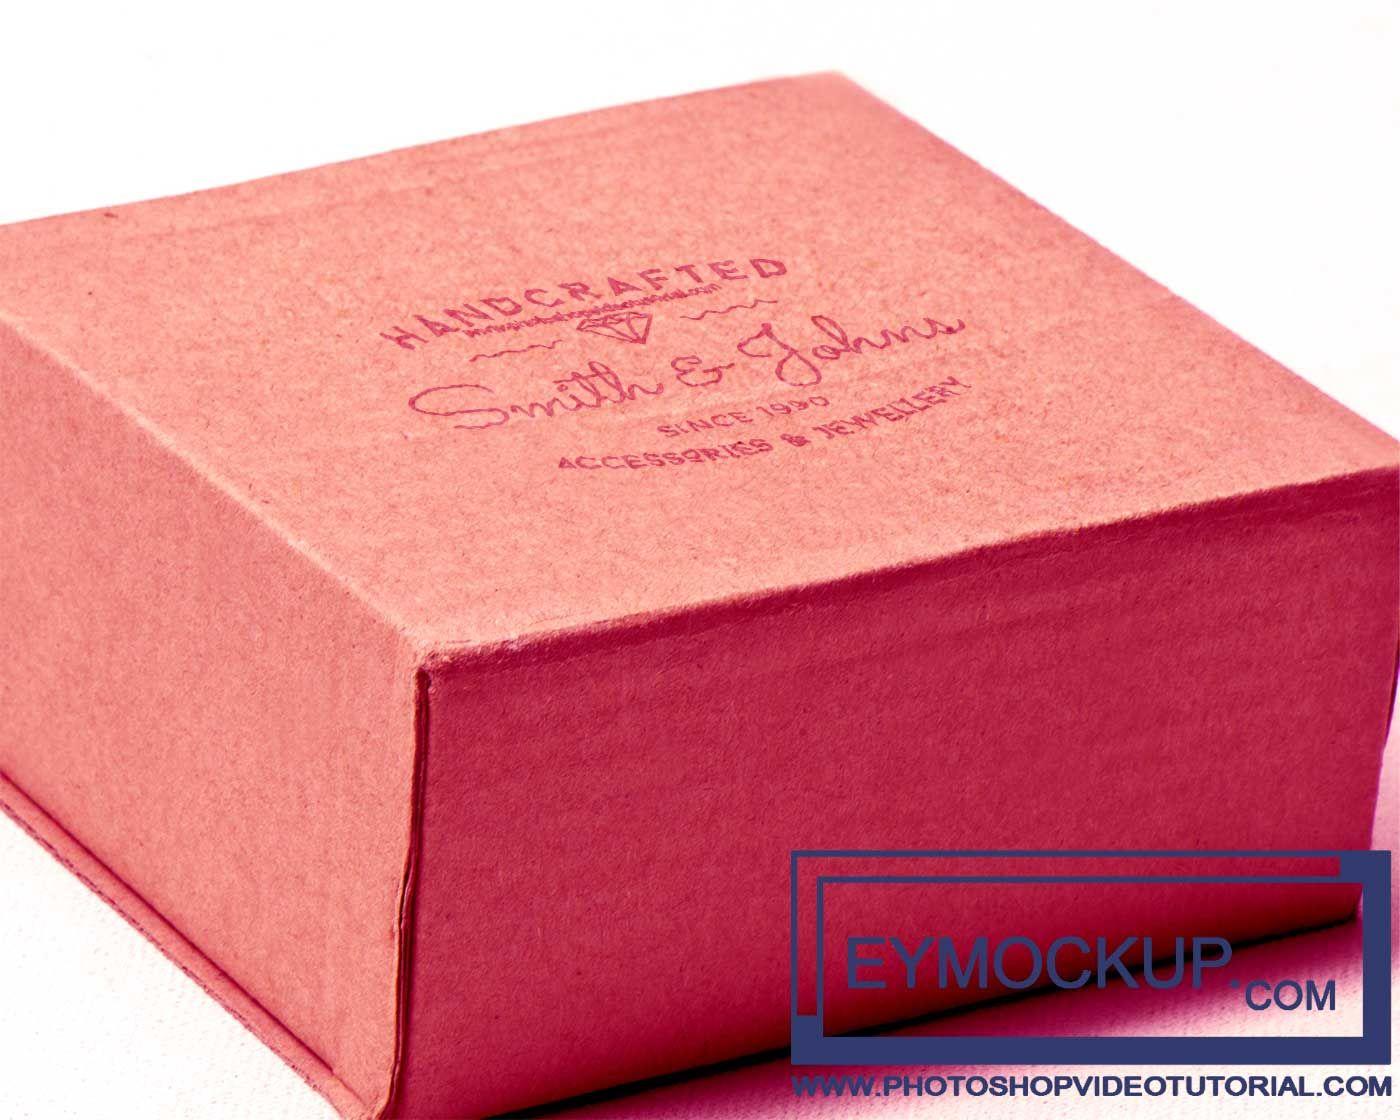 Download Free Realistic Box Logo Mockups Branding Download Downloadpsd Free Freemockup Freepsd Freebie Logomockups Moc Logo Mockup Mockup Free Psd Free Mockup